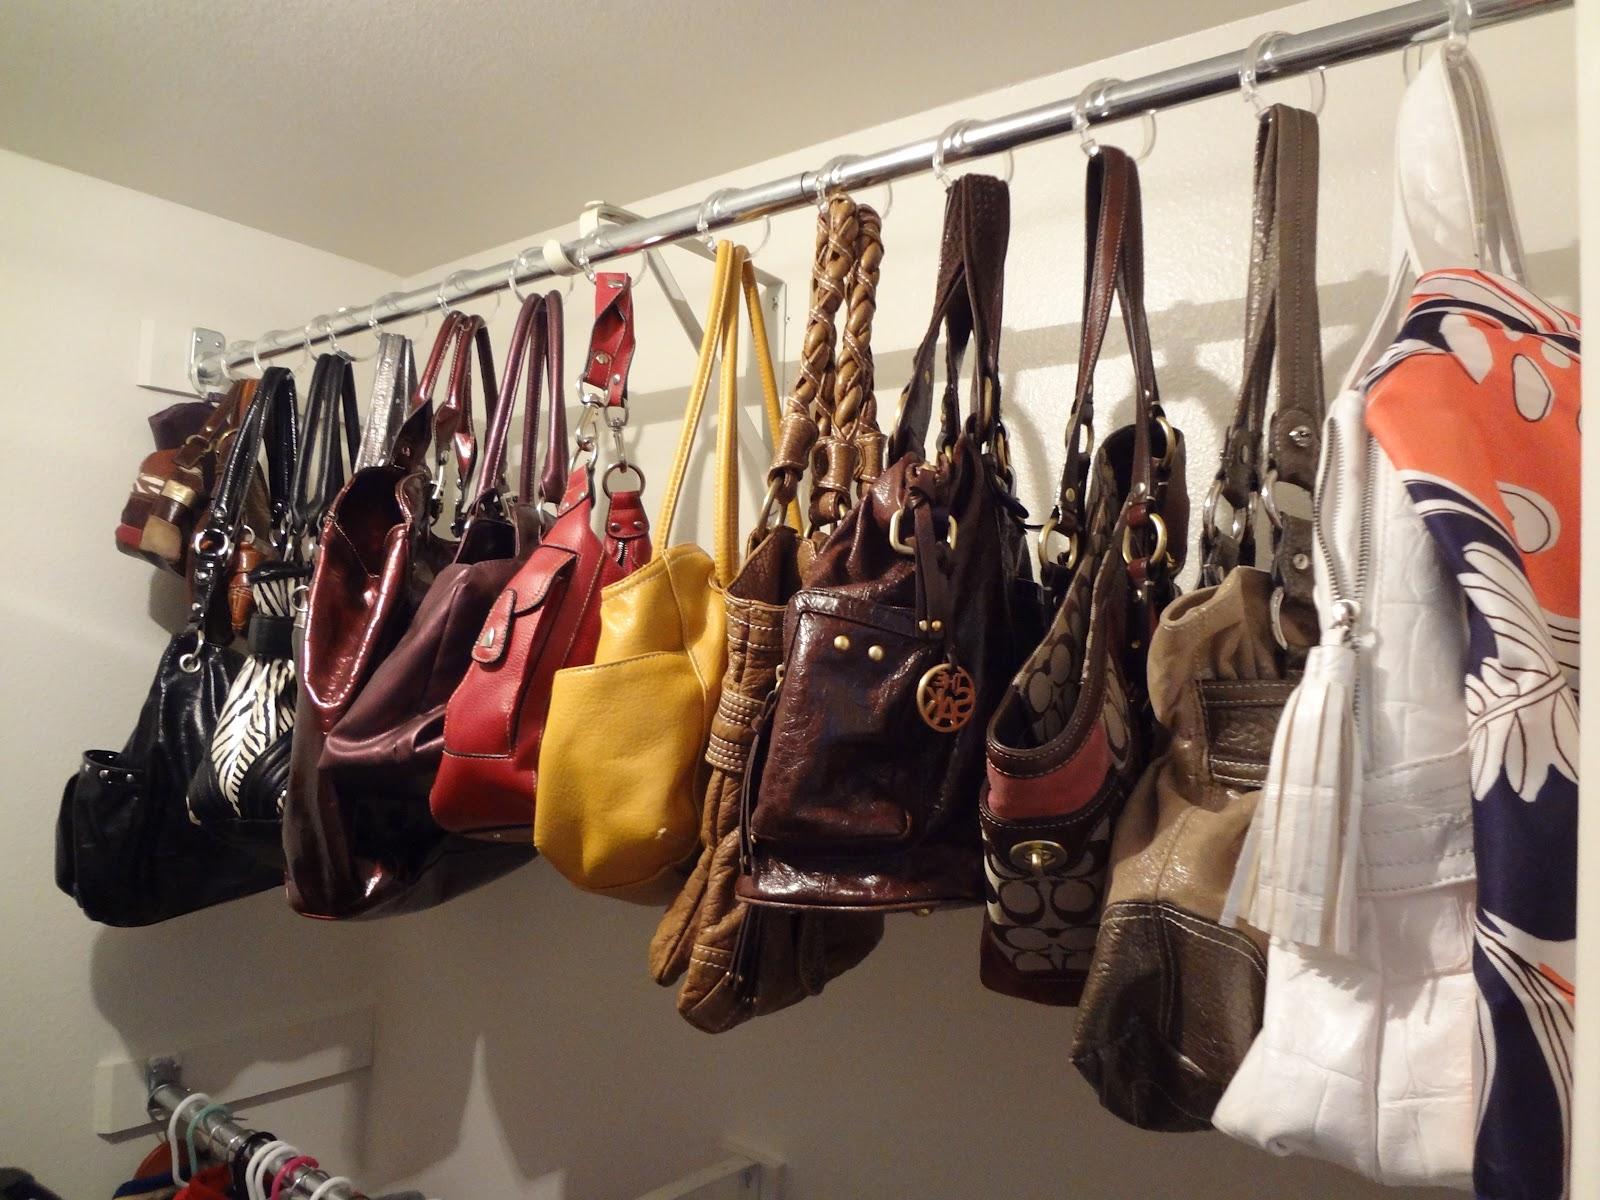 хранение сумок в шкафу